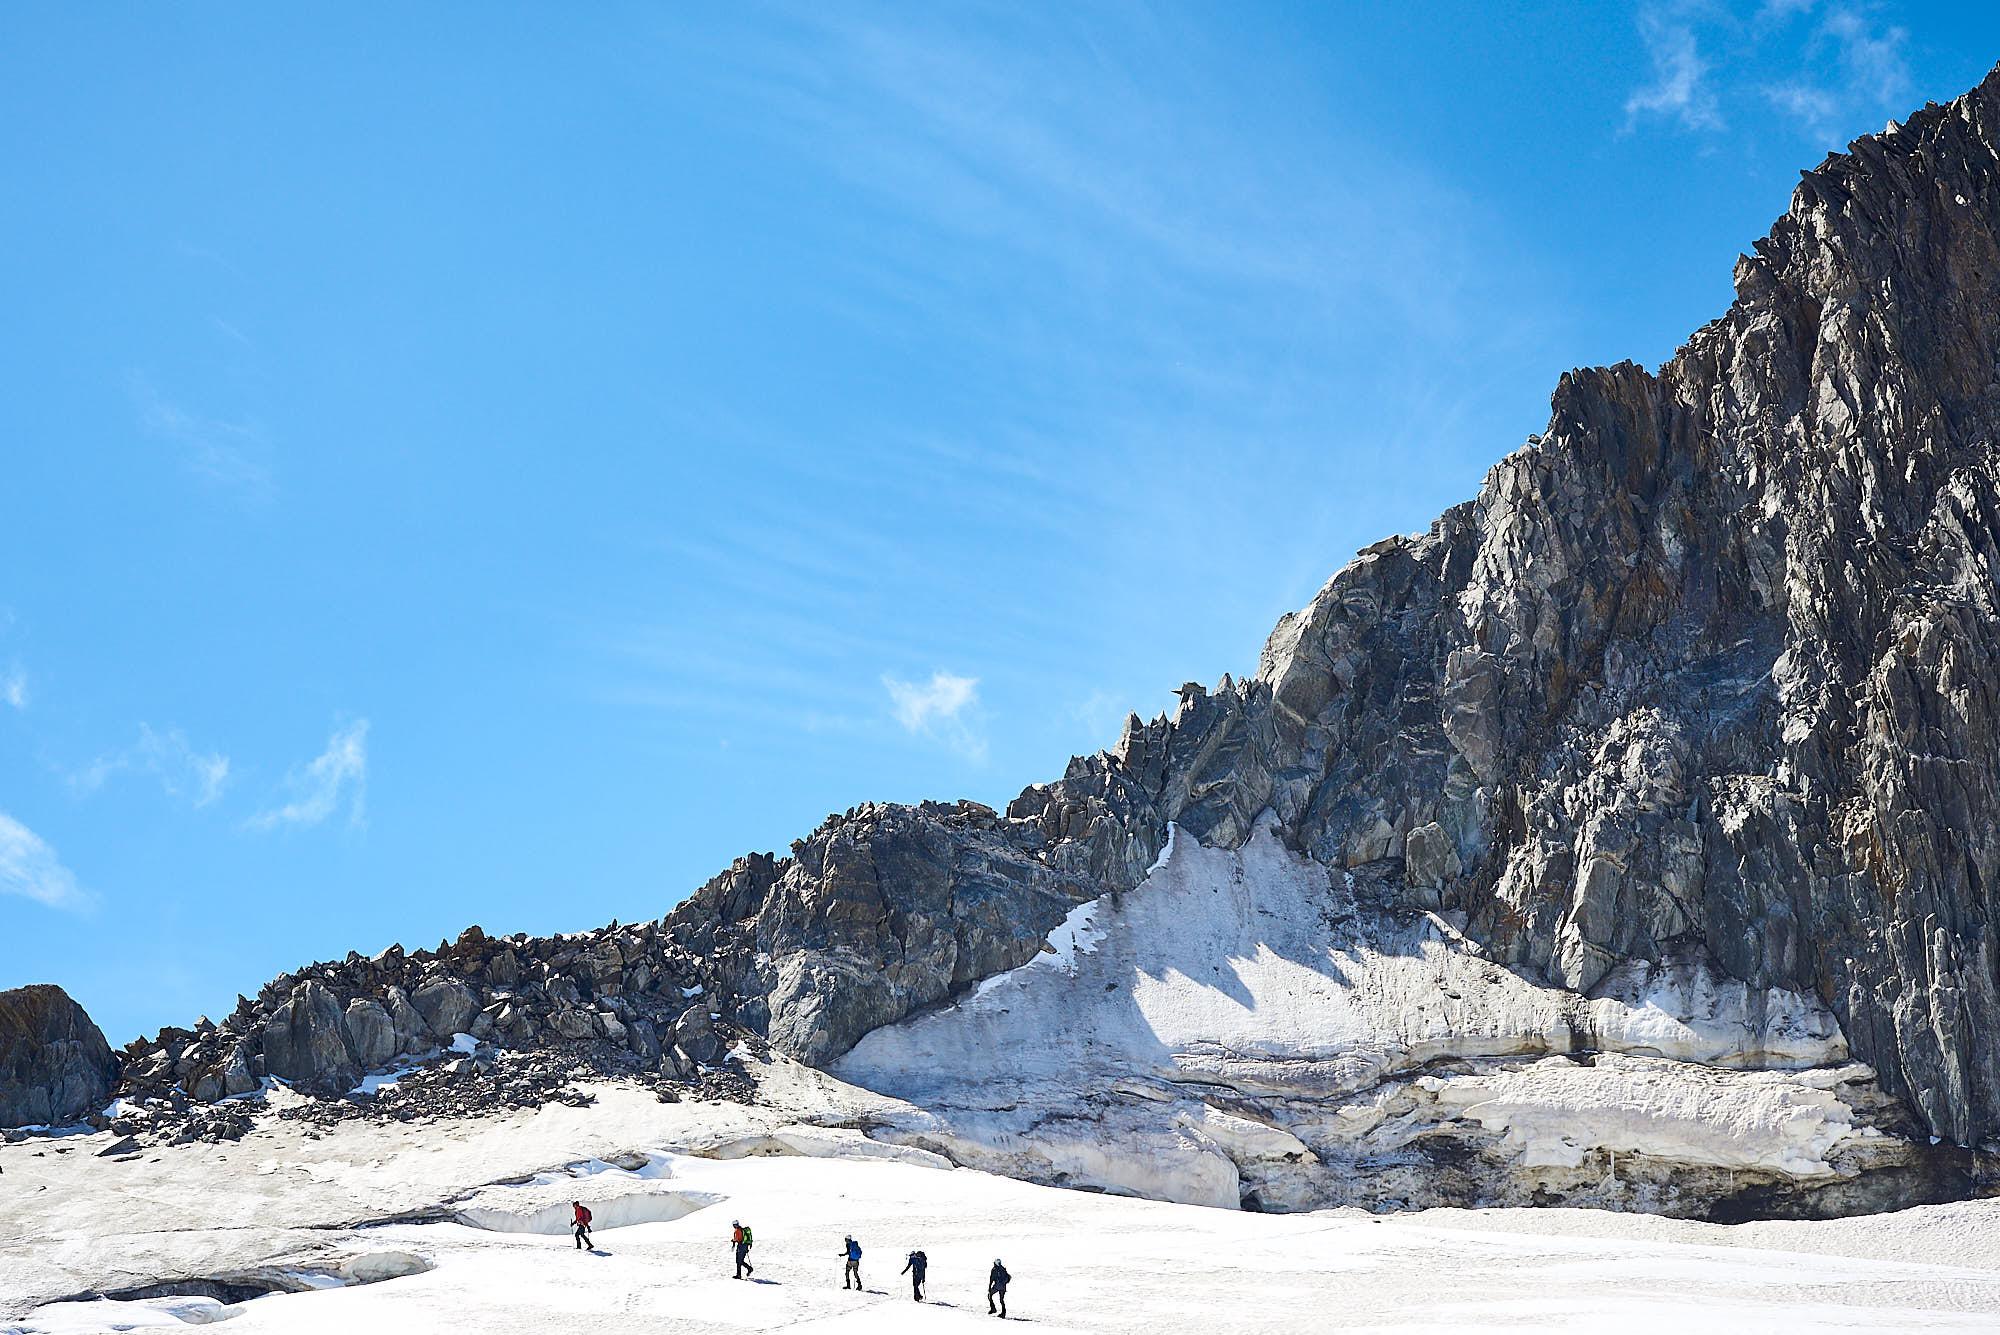 Mountaineers approaching a ridge in the Italian Alps